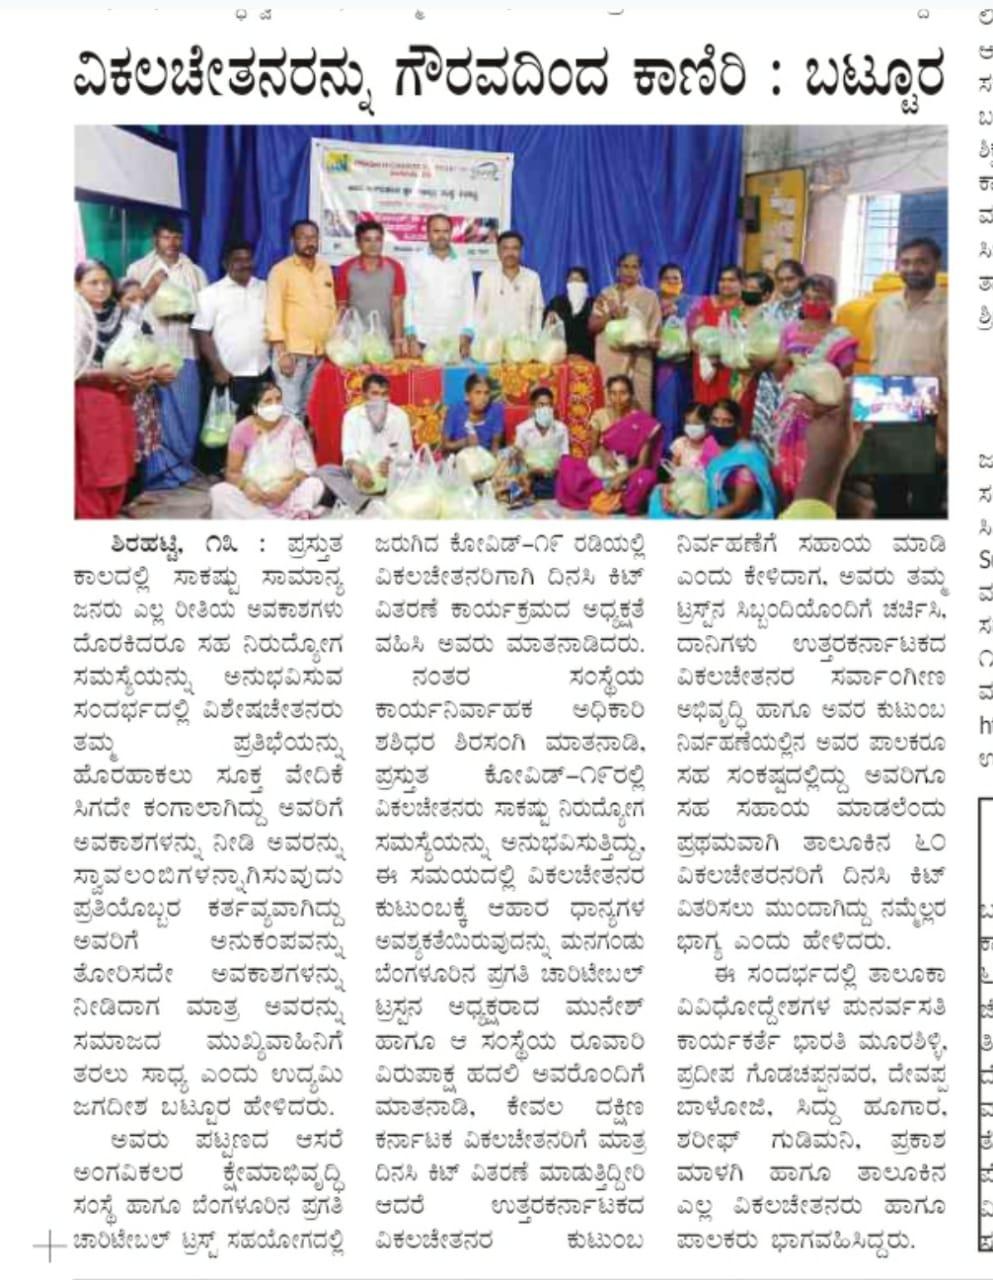 /media/aasare/1NGO-00047-Aasare_Angavikalara_Kshemabhivruddhi_and_Grameenabhivruddhi_Samsthe-Paper_Media_Coverage-1.jpeg